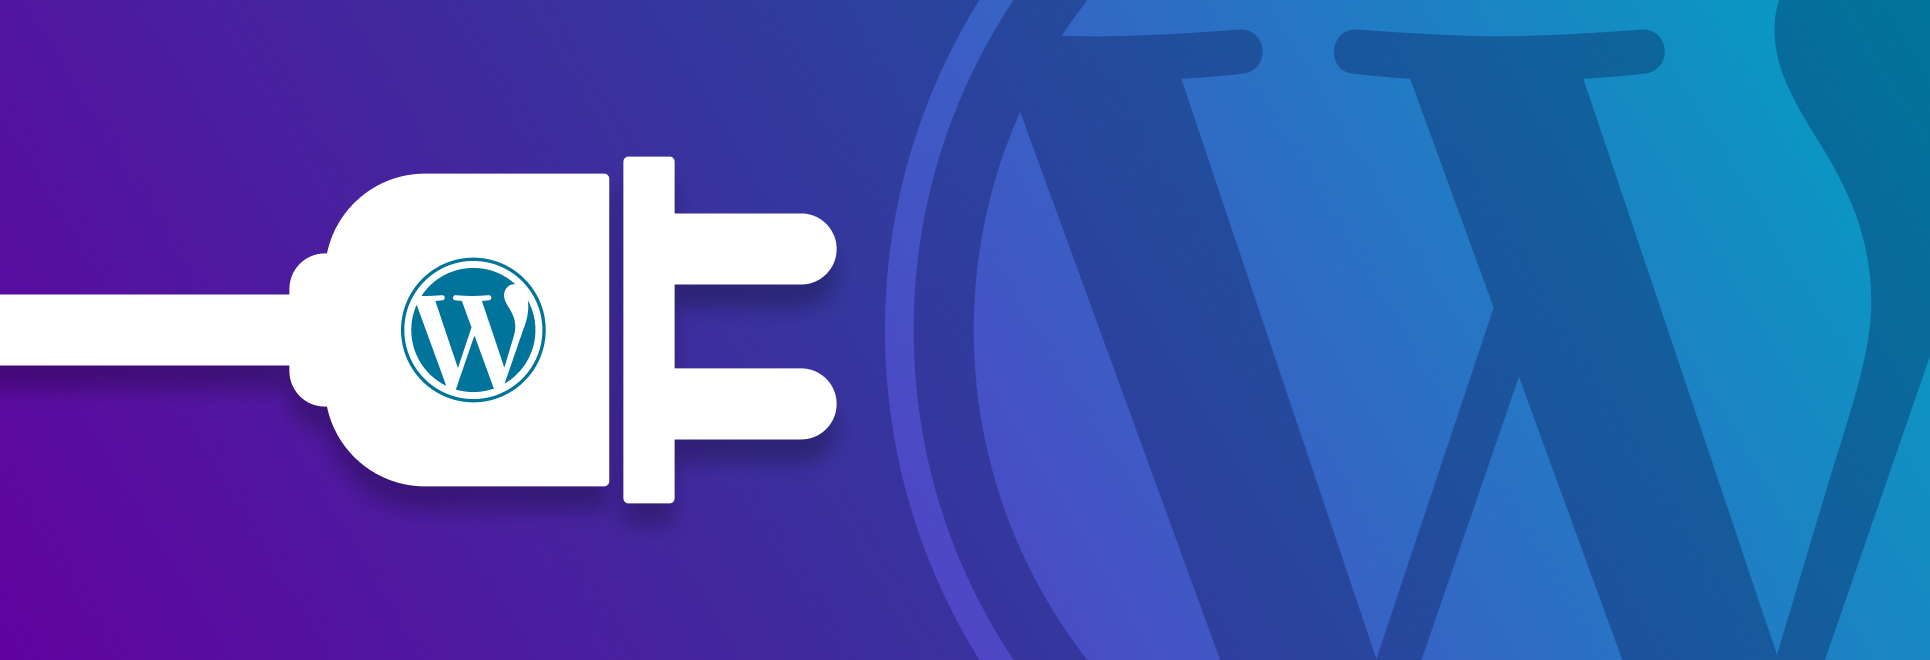 WordPress Web Design Plugins | Integrity XD